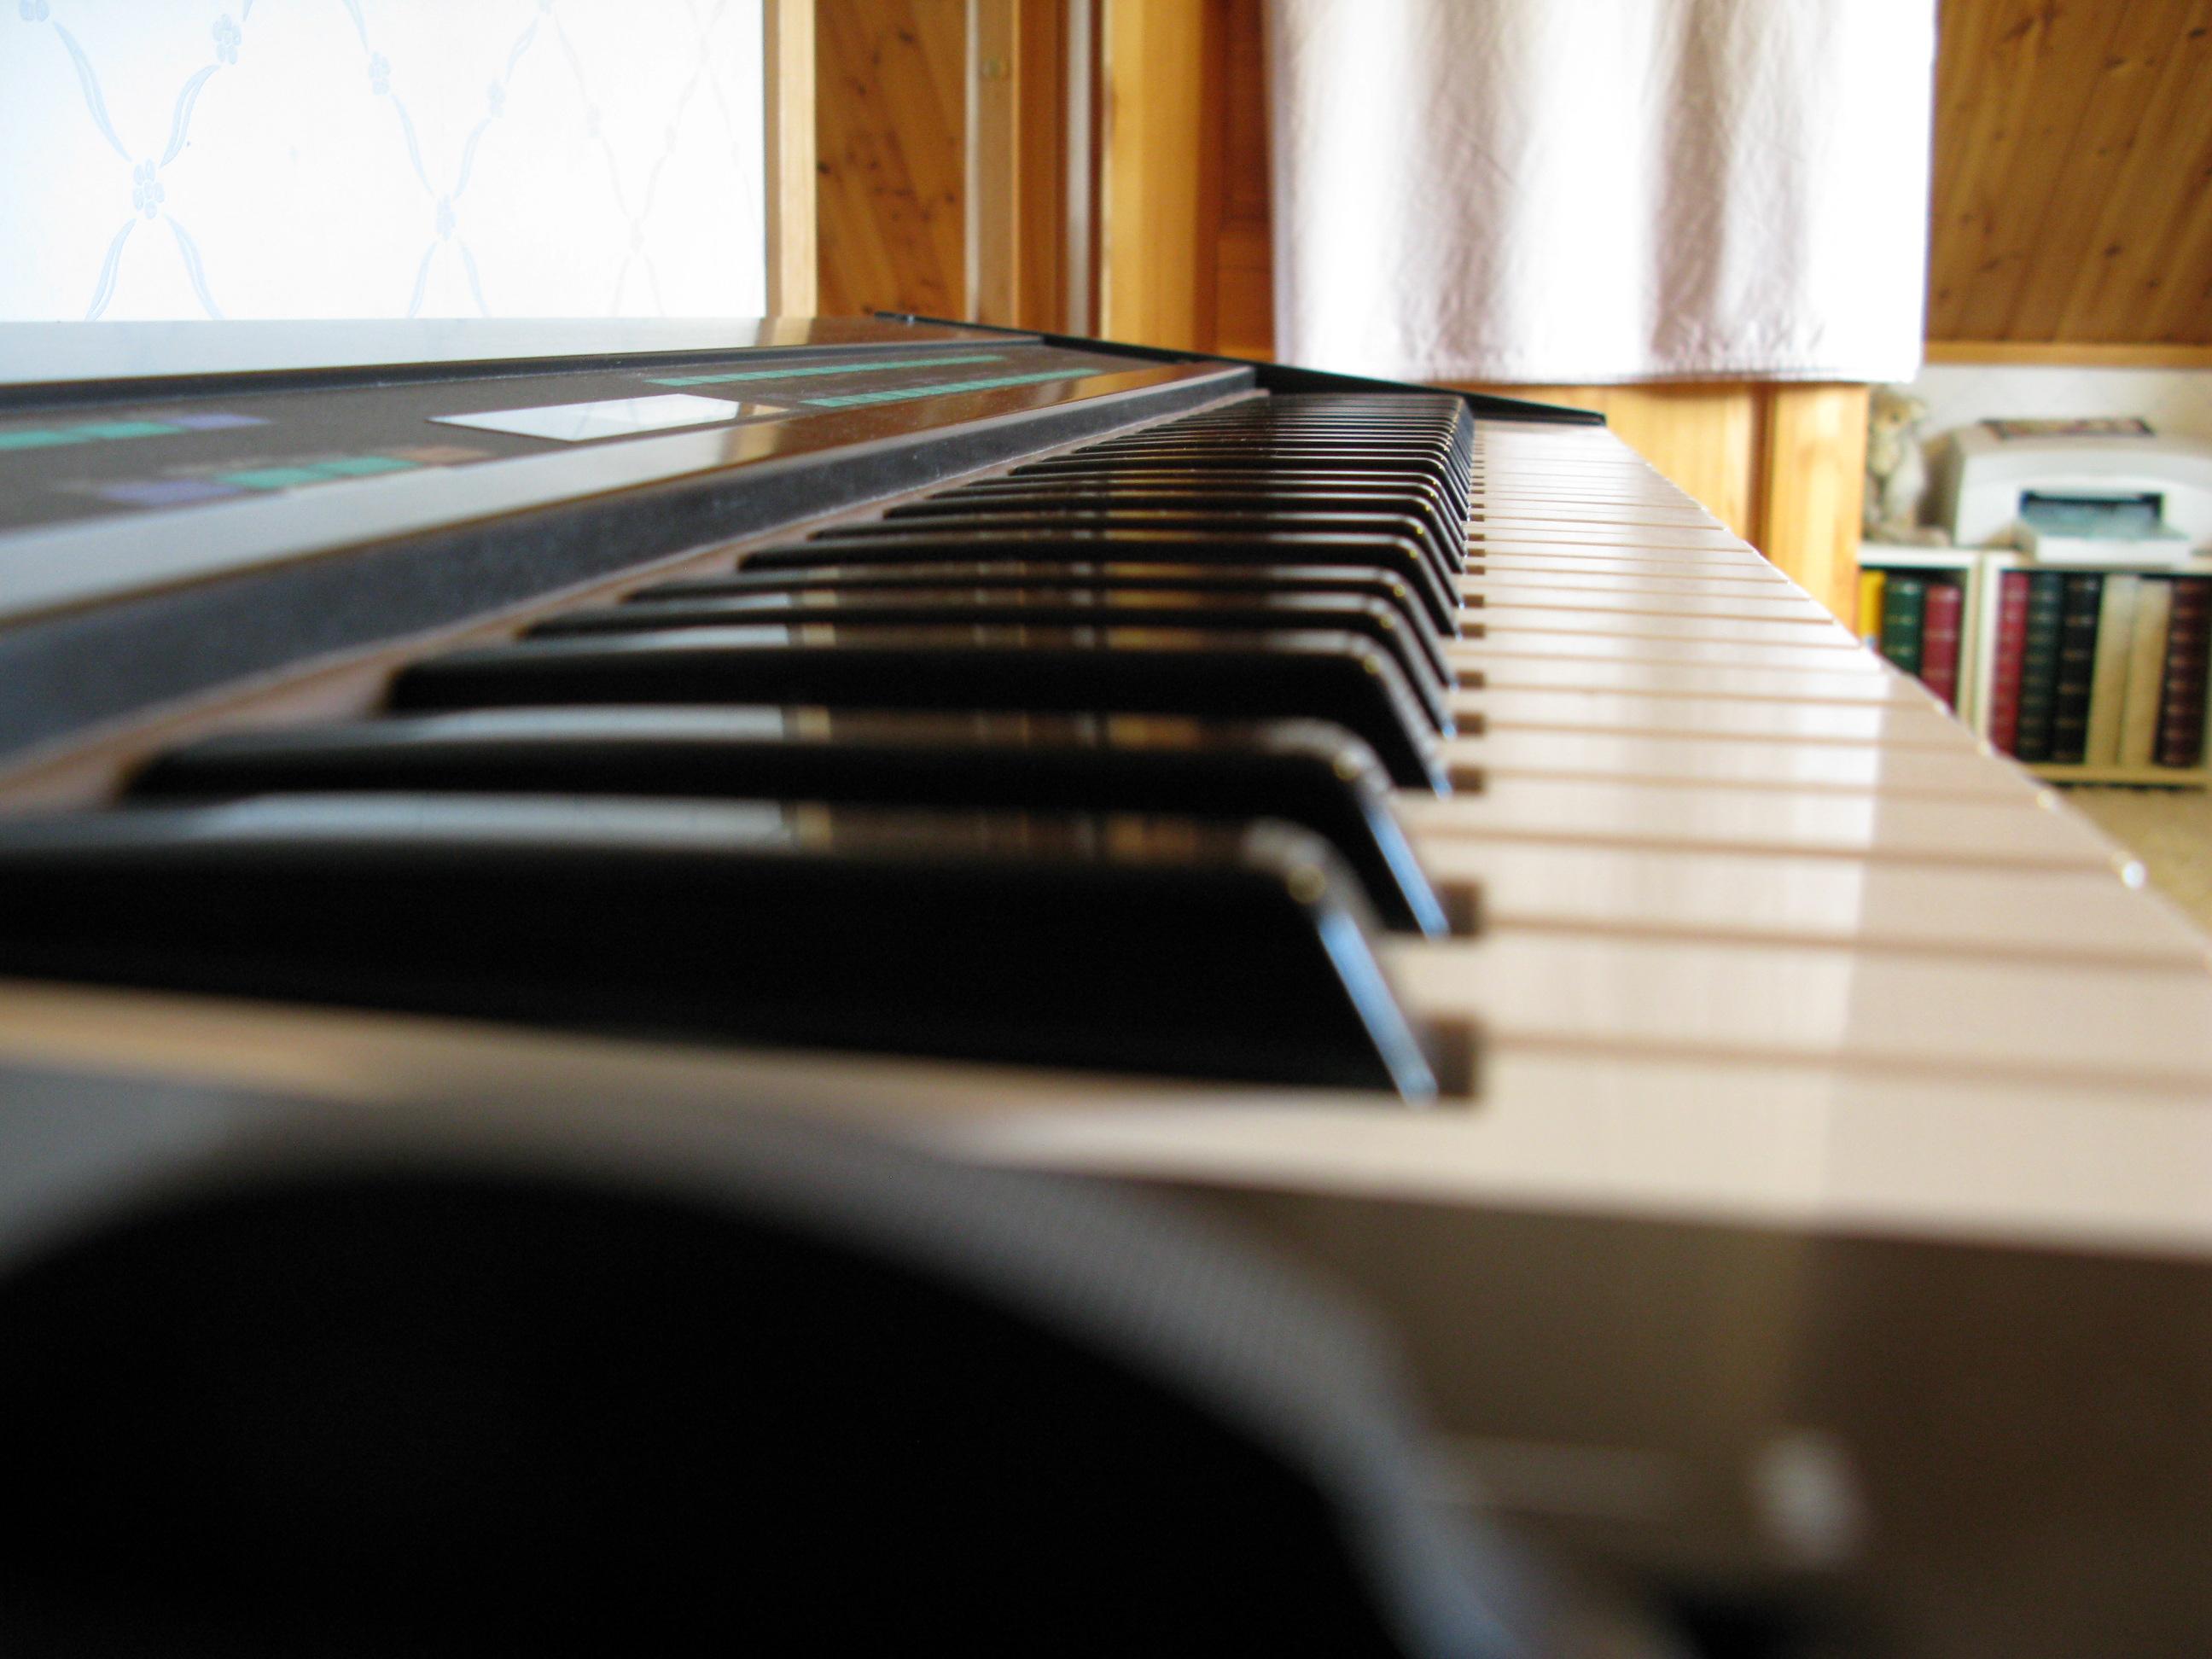 File:Yamaha DX7 Keyboard side view jpg - Wikimedia Commons